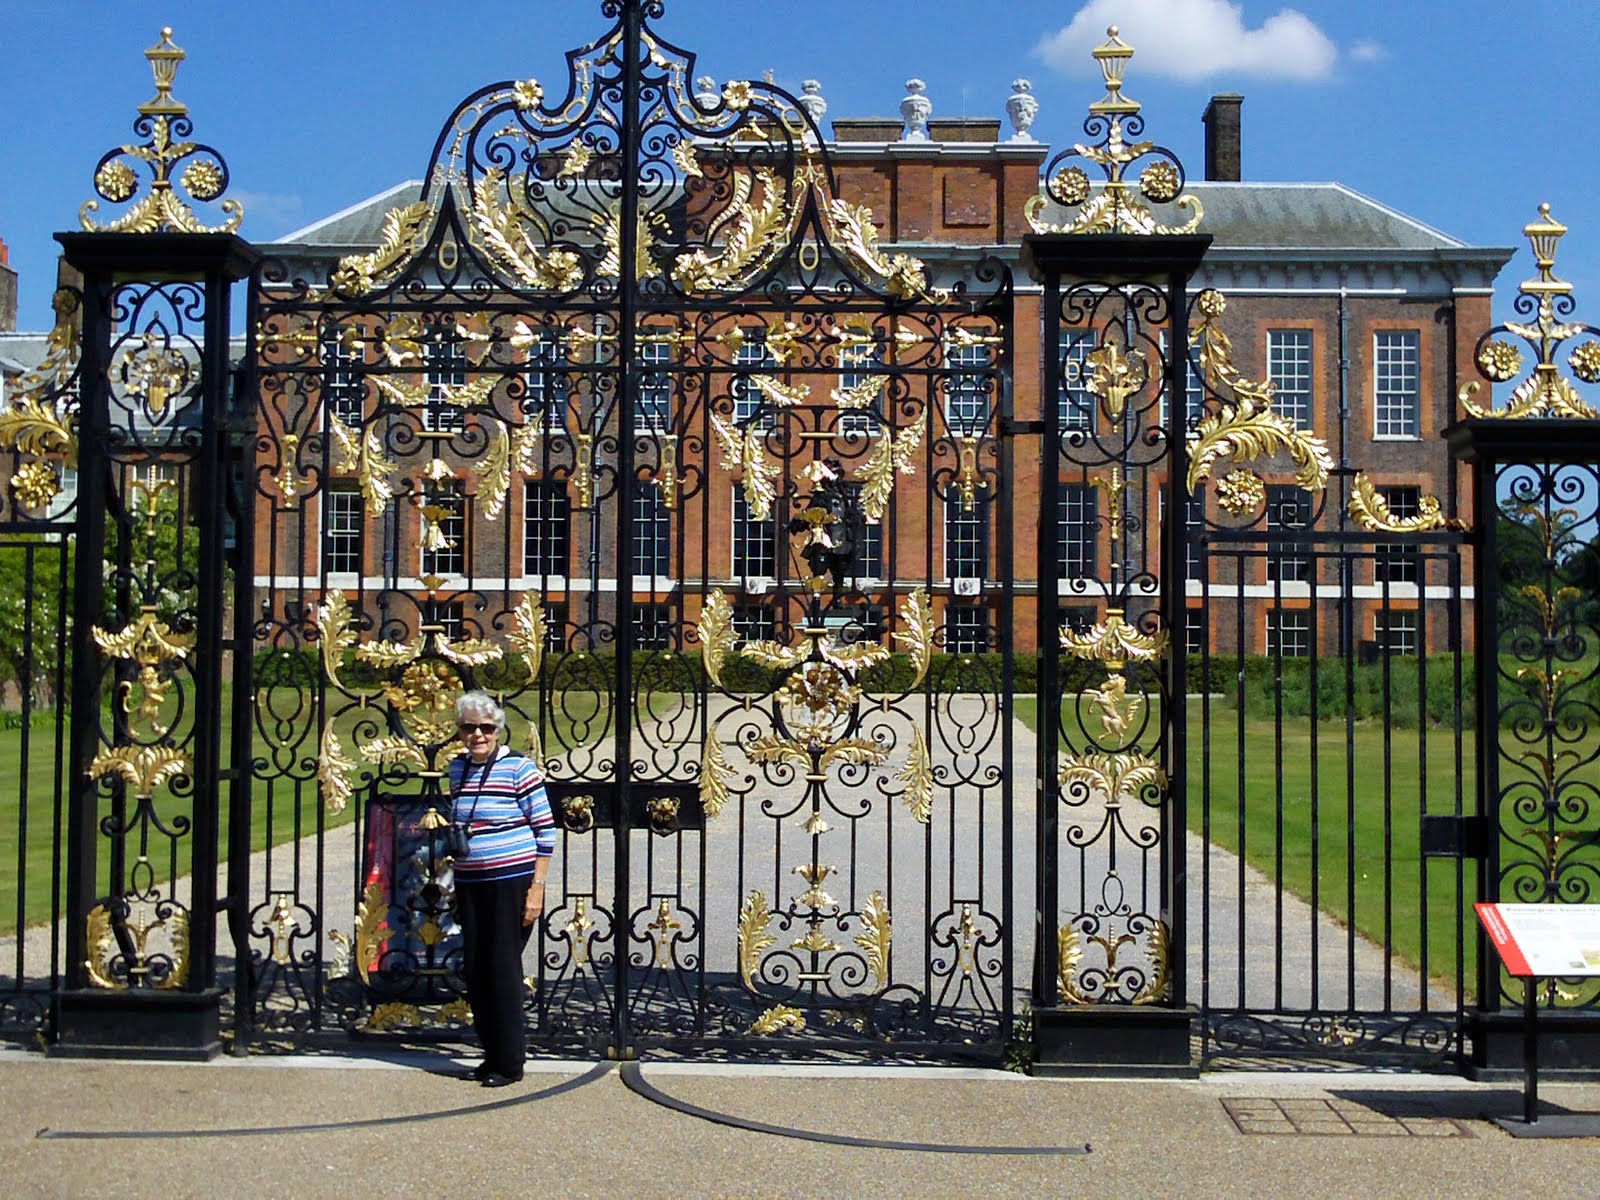 Birding In London June 21 2010 Kensington Palace And